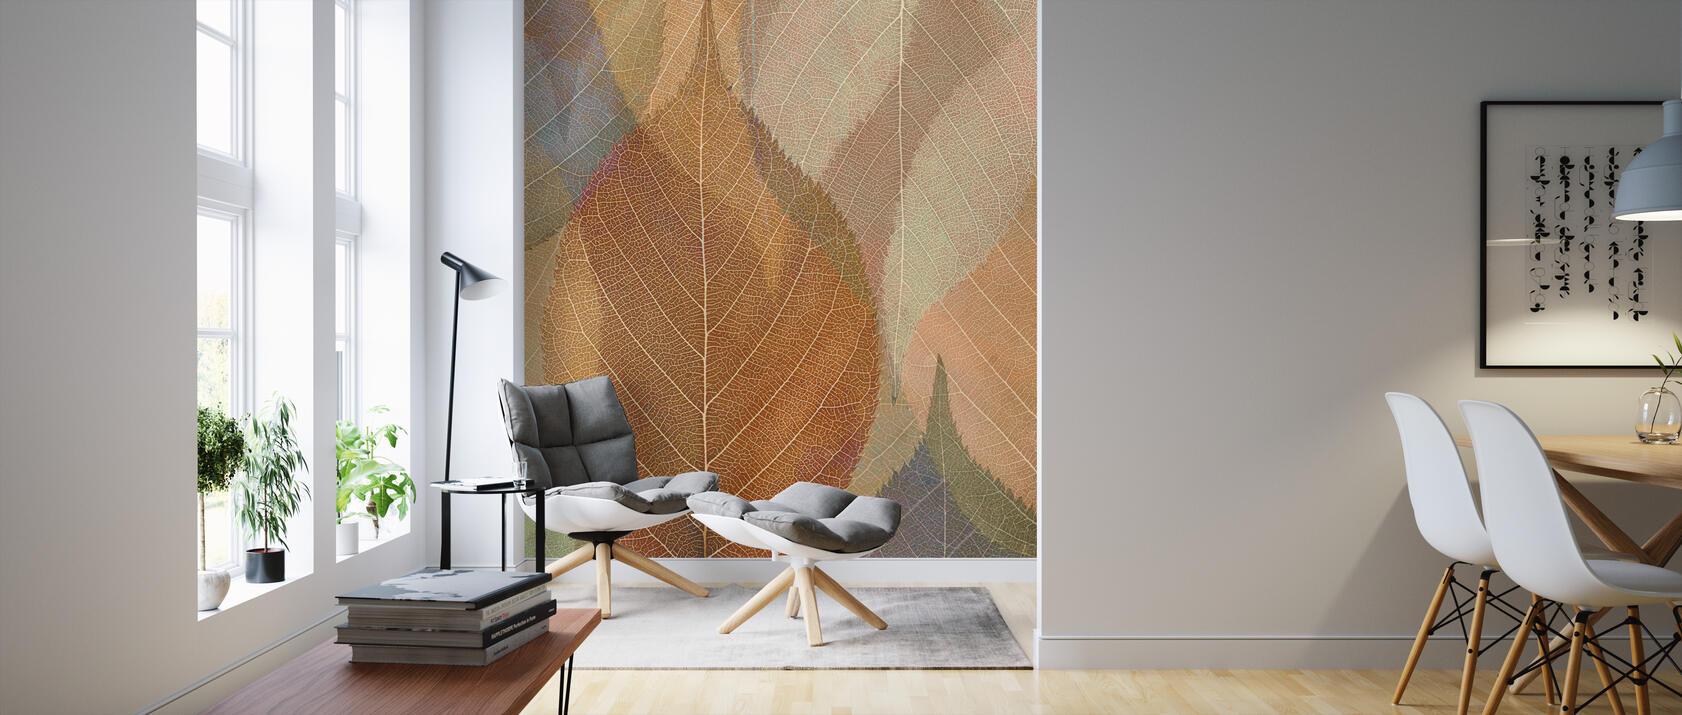 autumn leaf pattern fototapeten online photowall. Black Bedroom Furniture Sets. Home Design Ideas